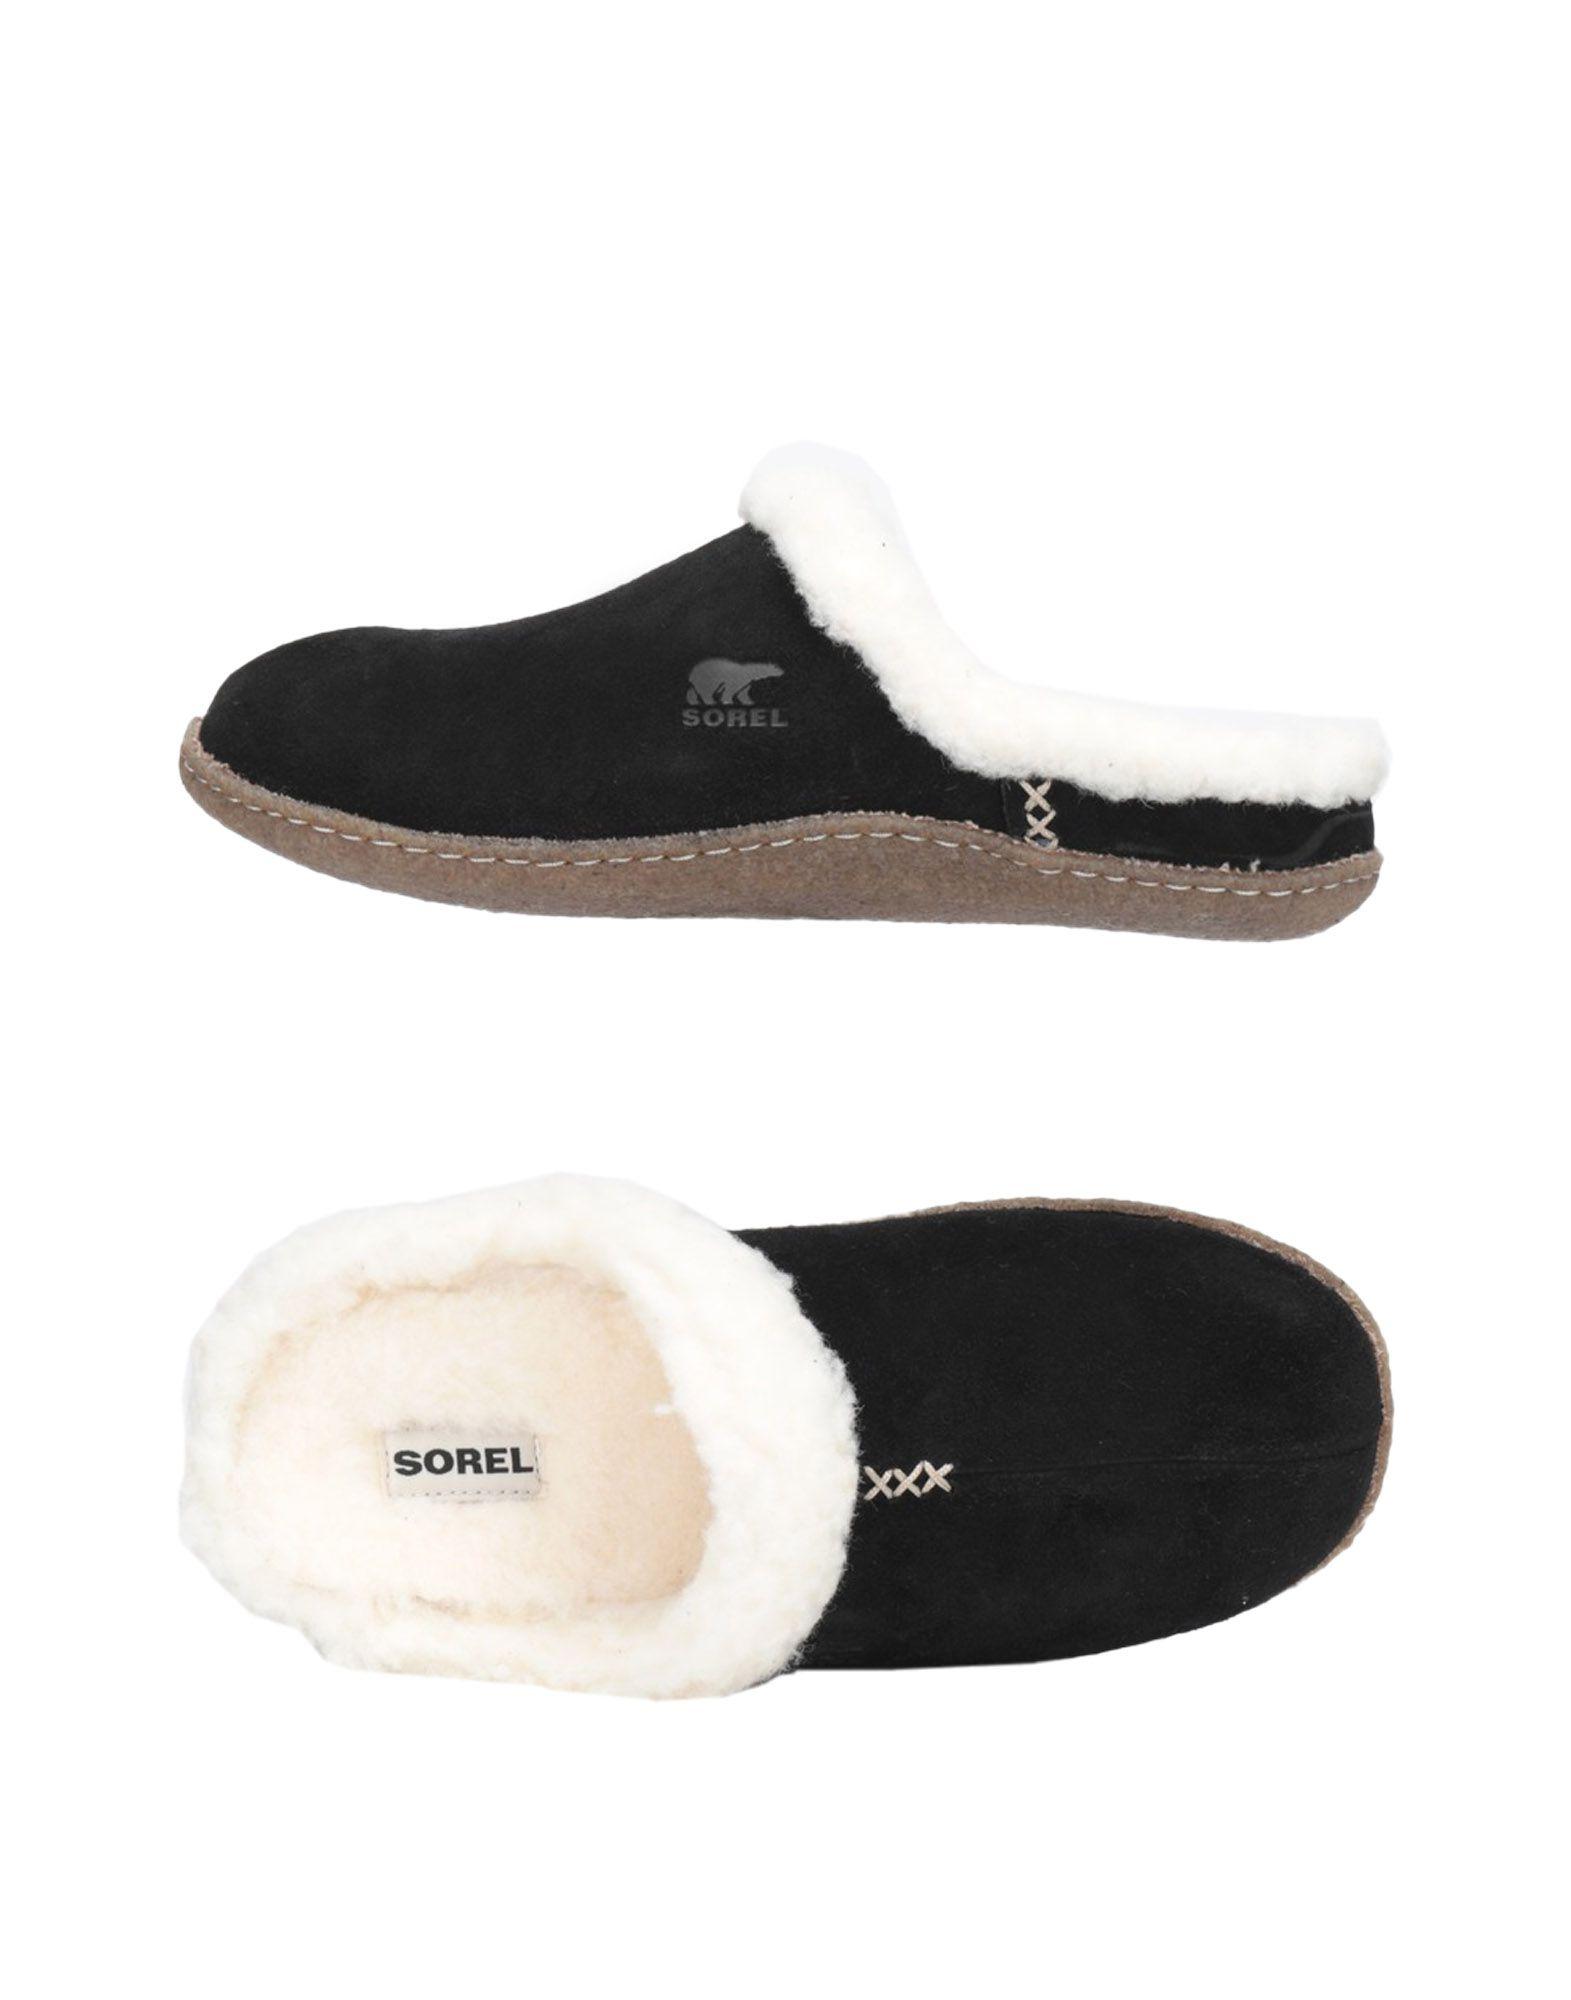 Sorel Nakiska Slide  11336434AD Gute Qualität beliebte Schuhe